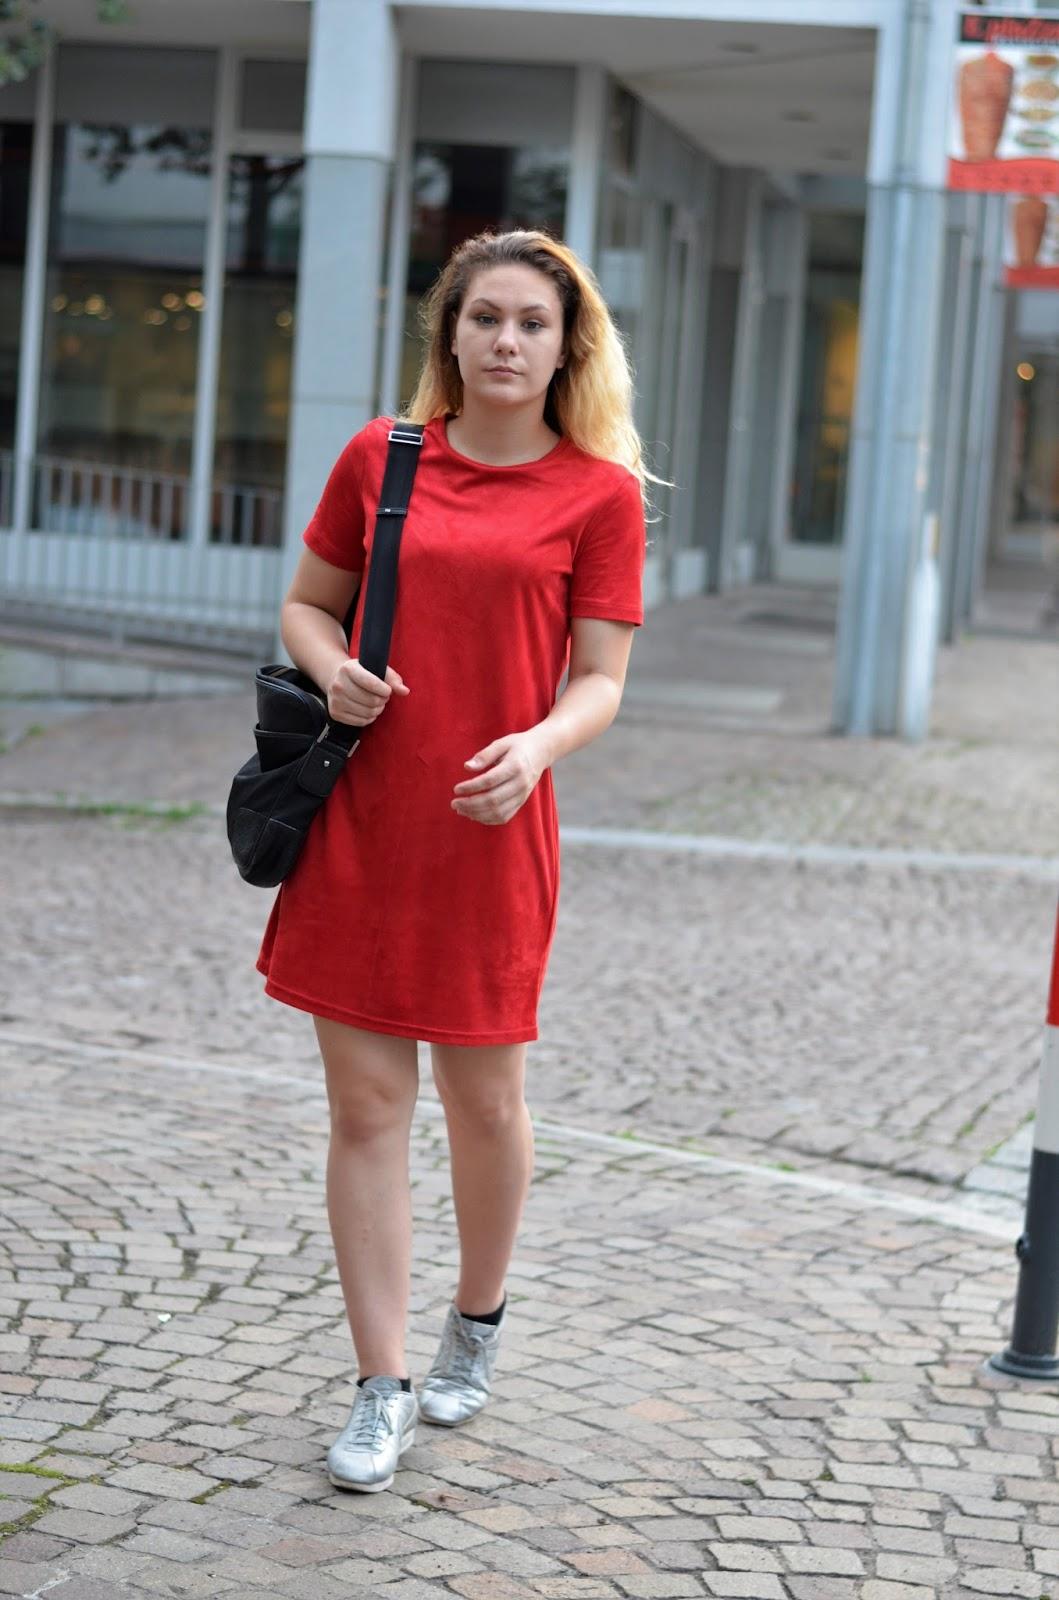 Zara rotes kleid kleid